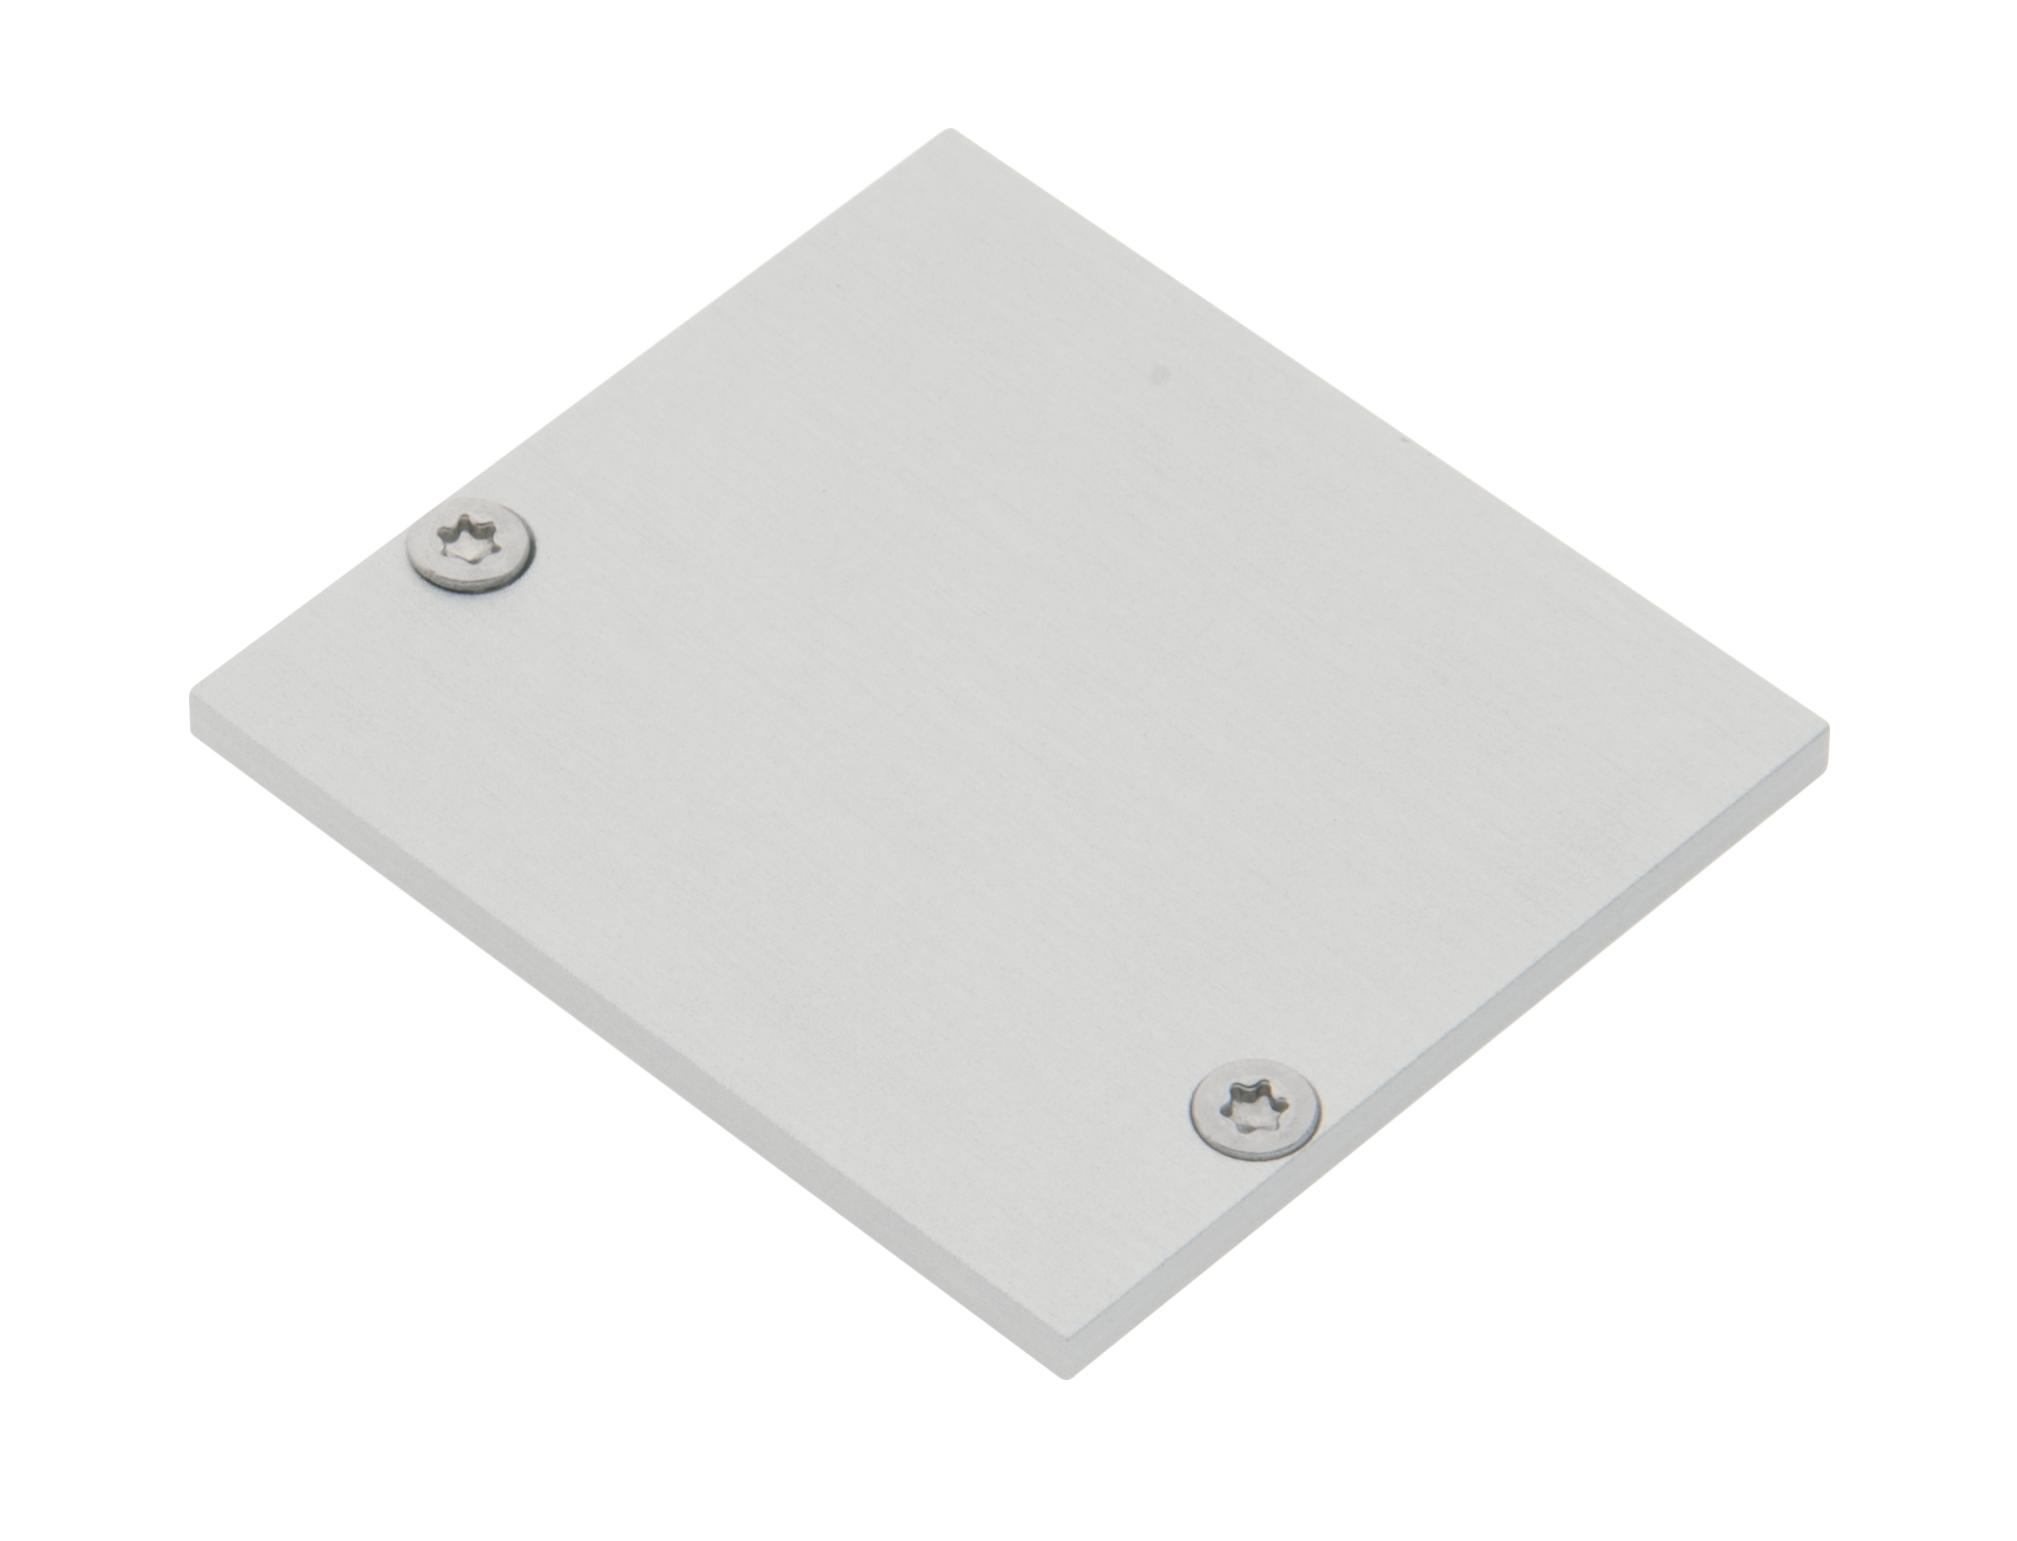 1 Stk Profil Endkappe MFL Eckig geschlossen inkl. Schrauben LIEK005520